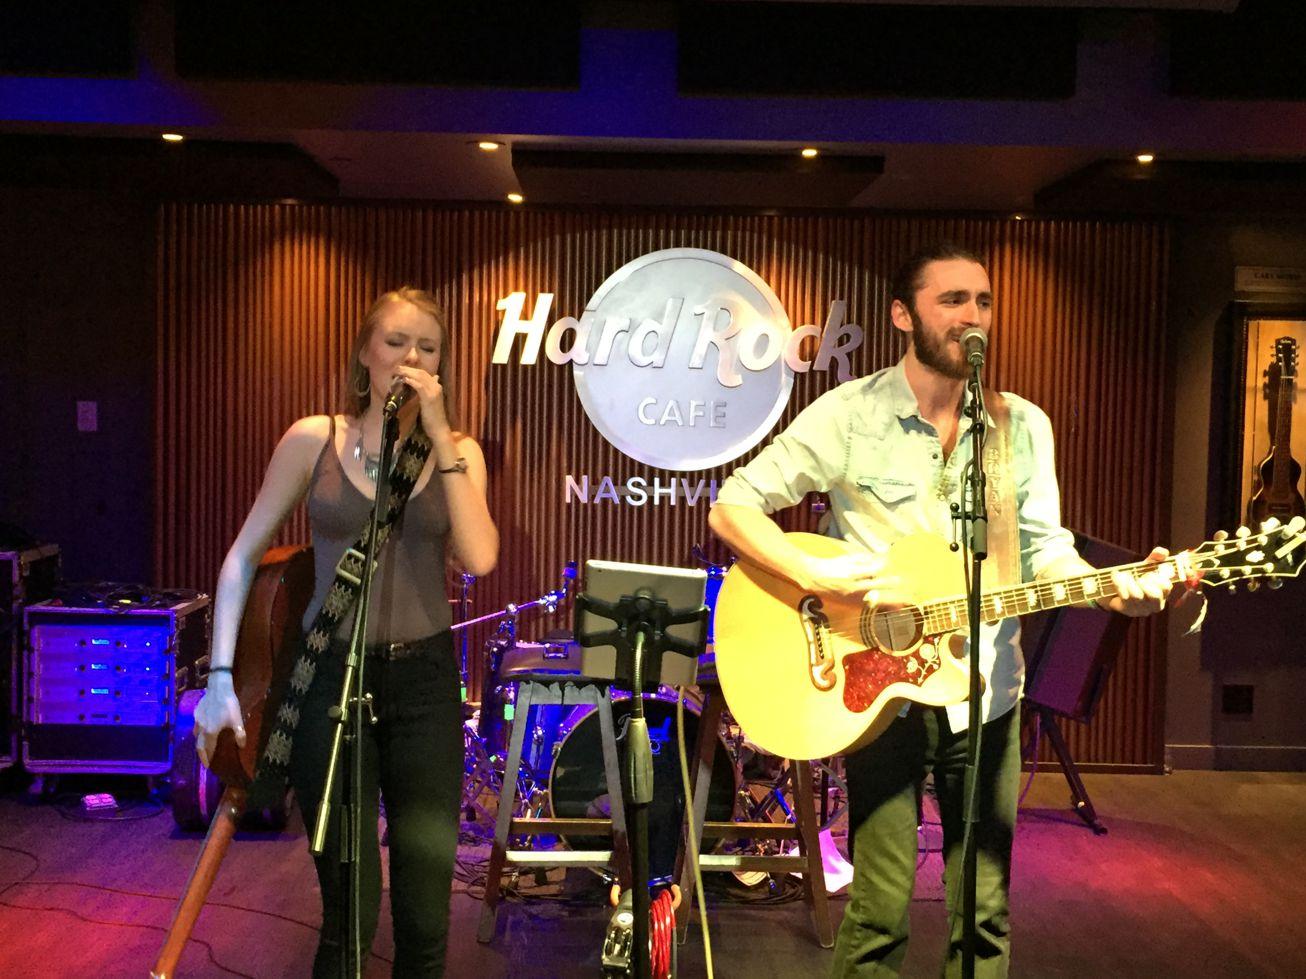 Nashville_hard_rock3.jpg